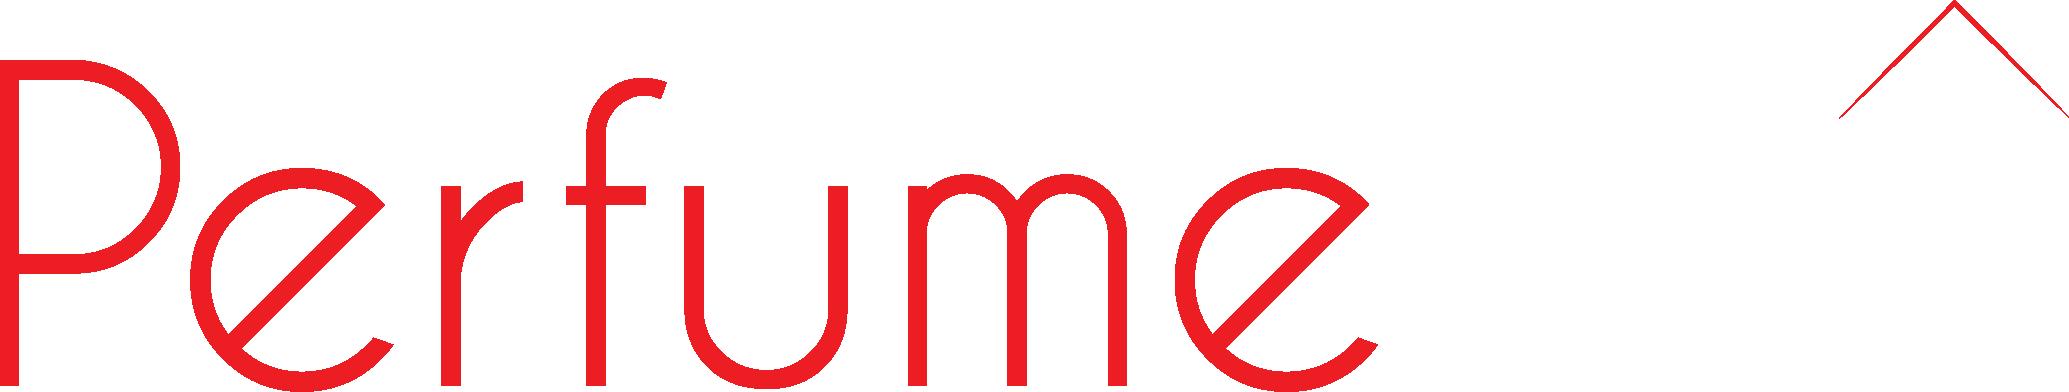 Perfume hut logo